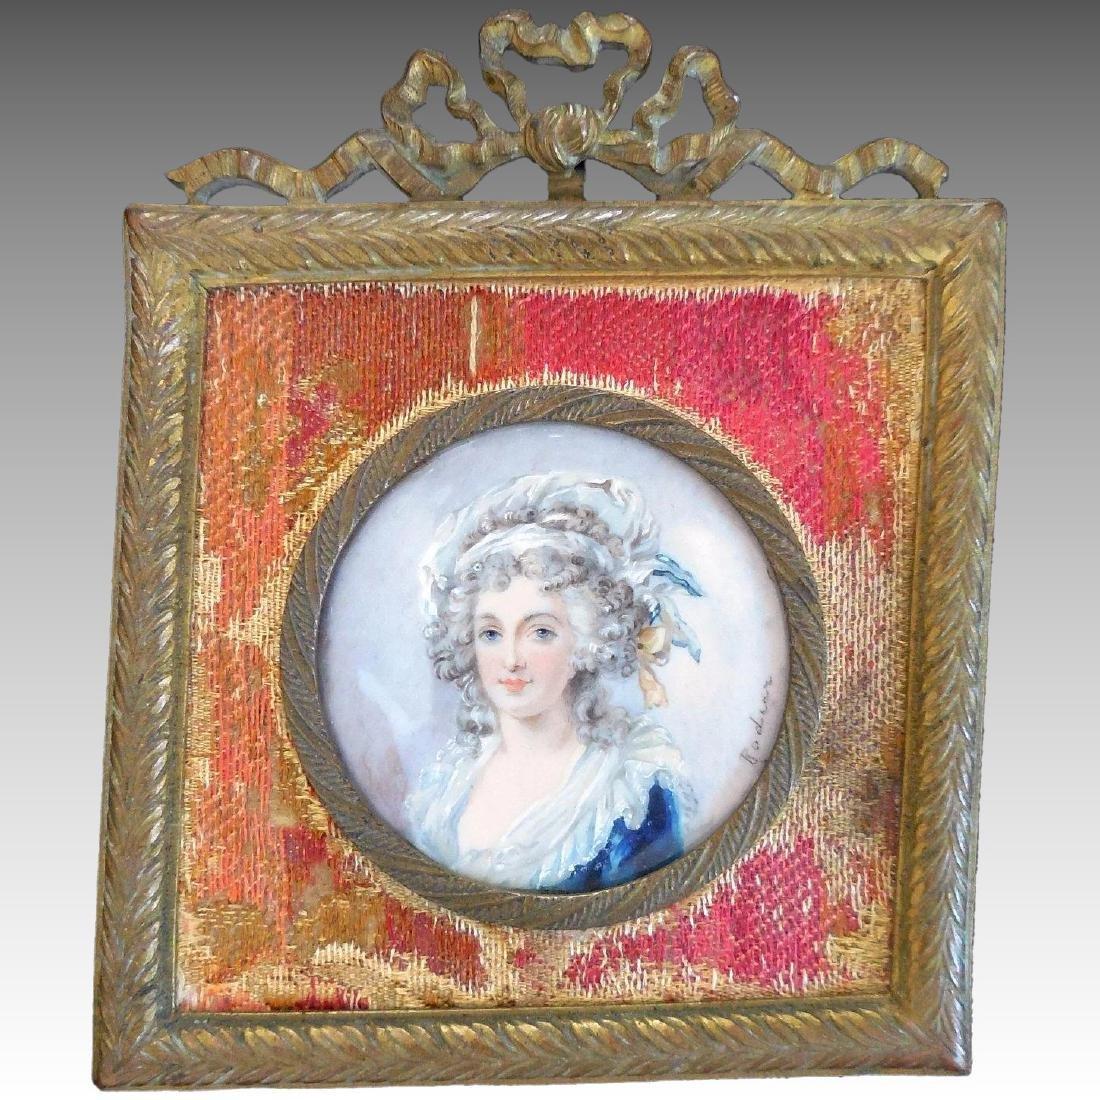 Antique Miniature Portrait, French, 18th/19th Century